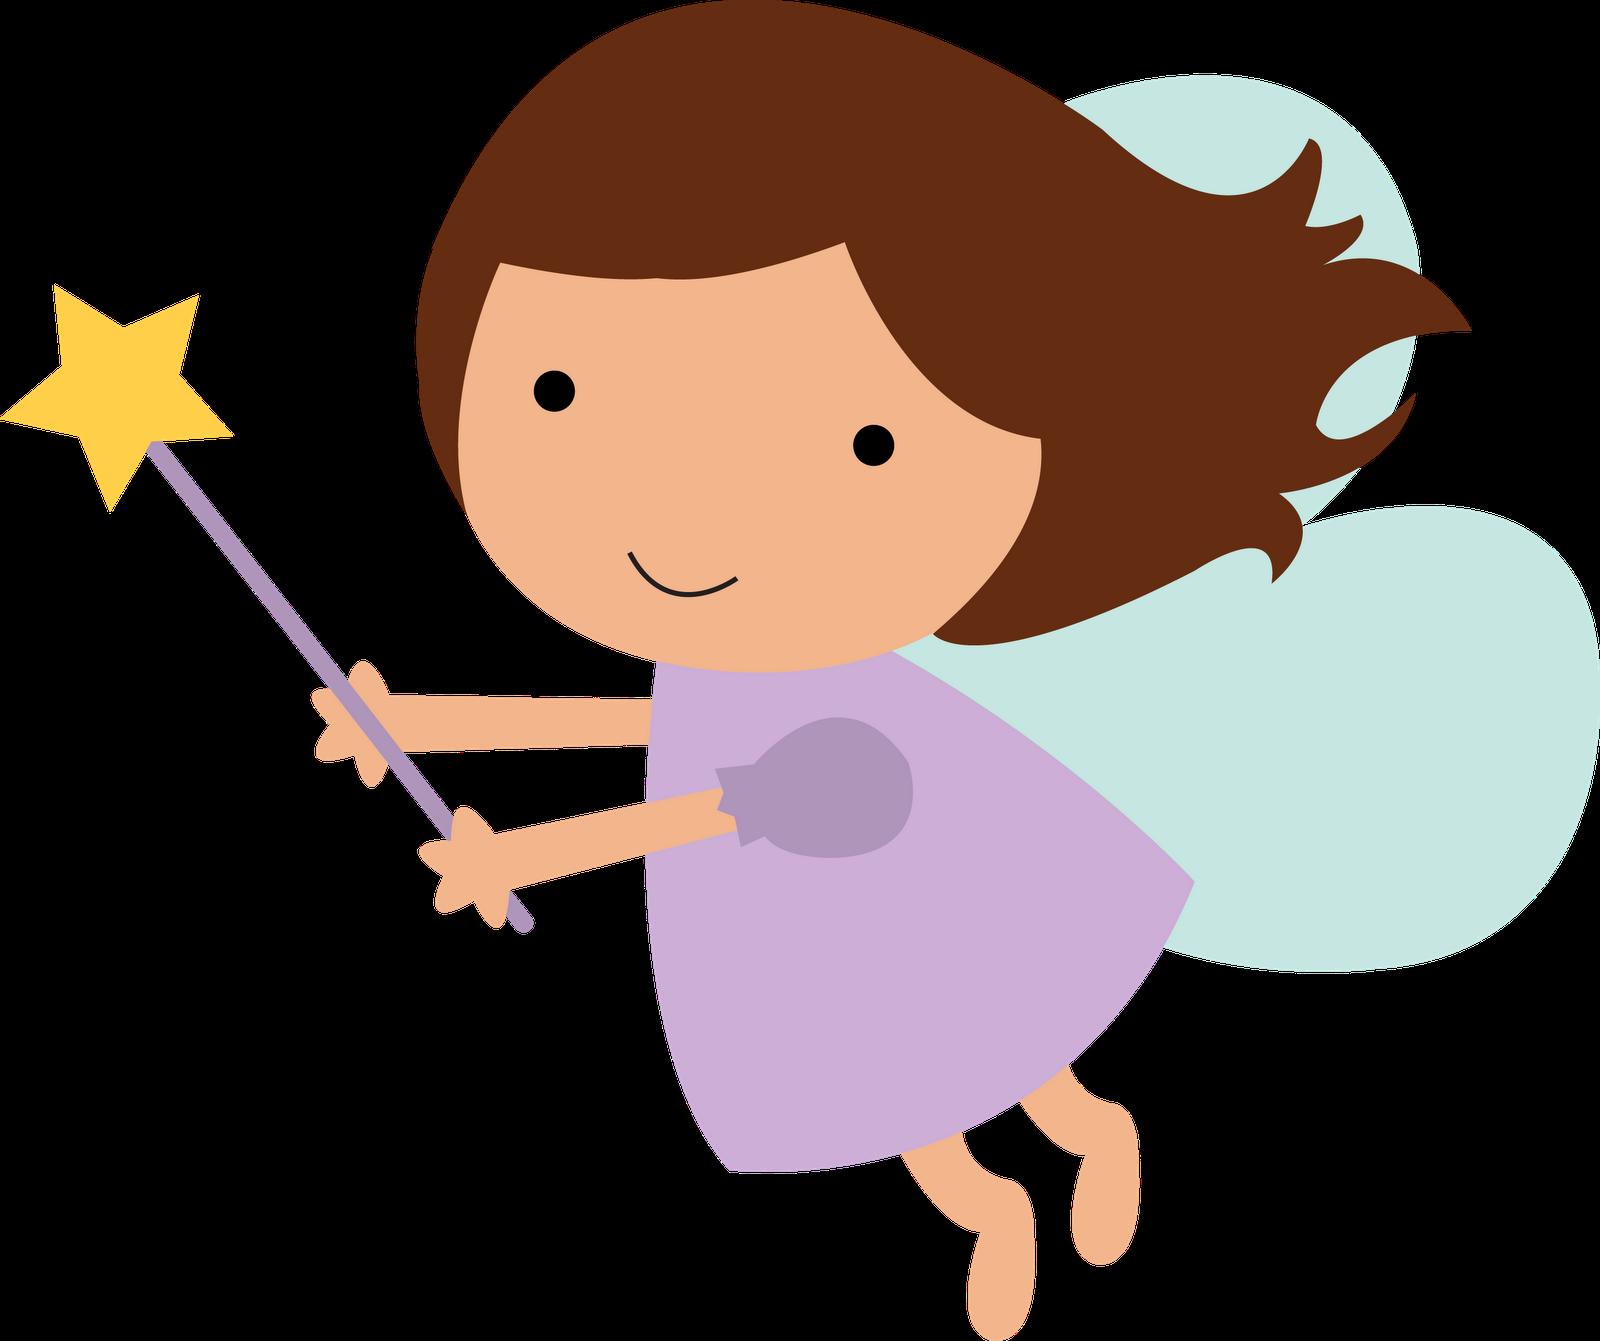 Fairy Clip Art Images Illustrations Phot-Fairy clip art images illustrations photos-11